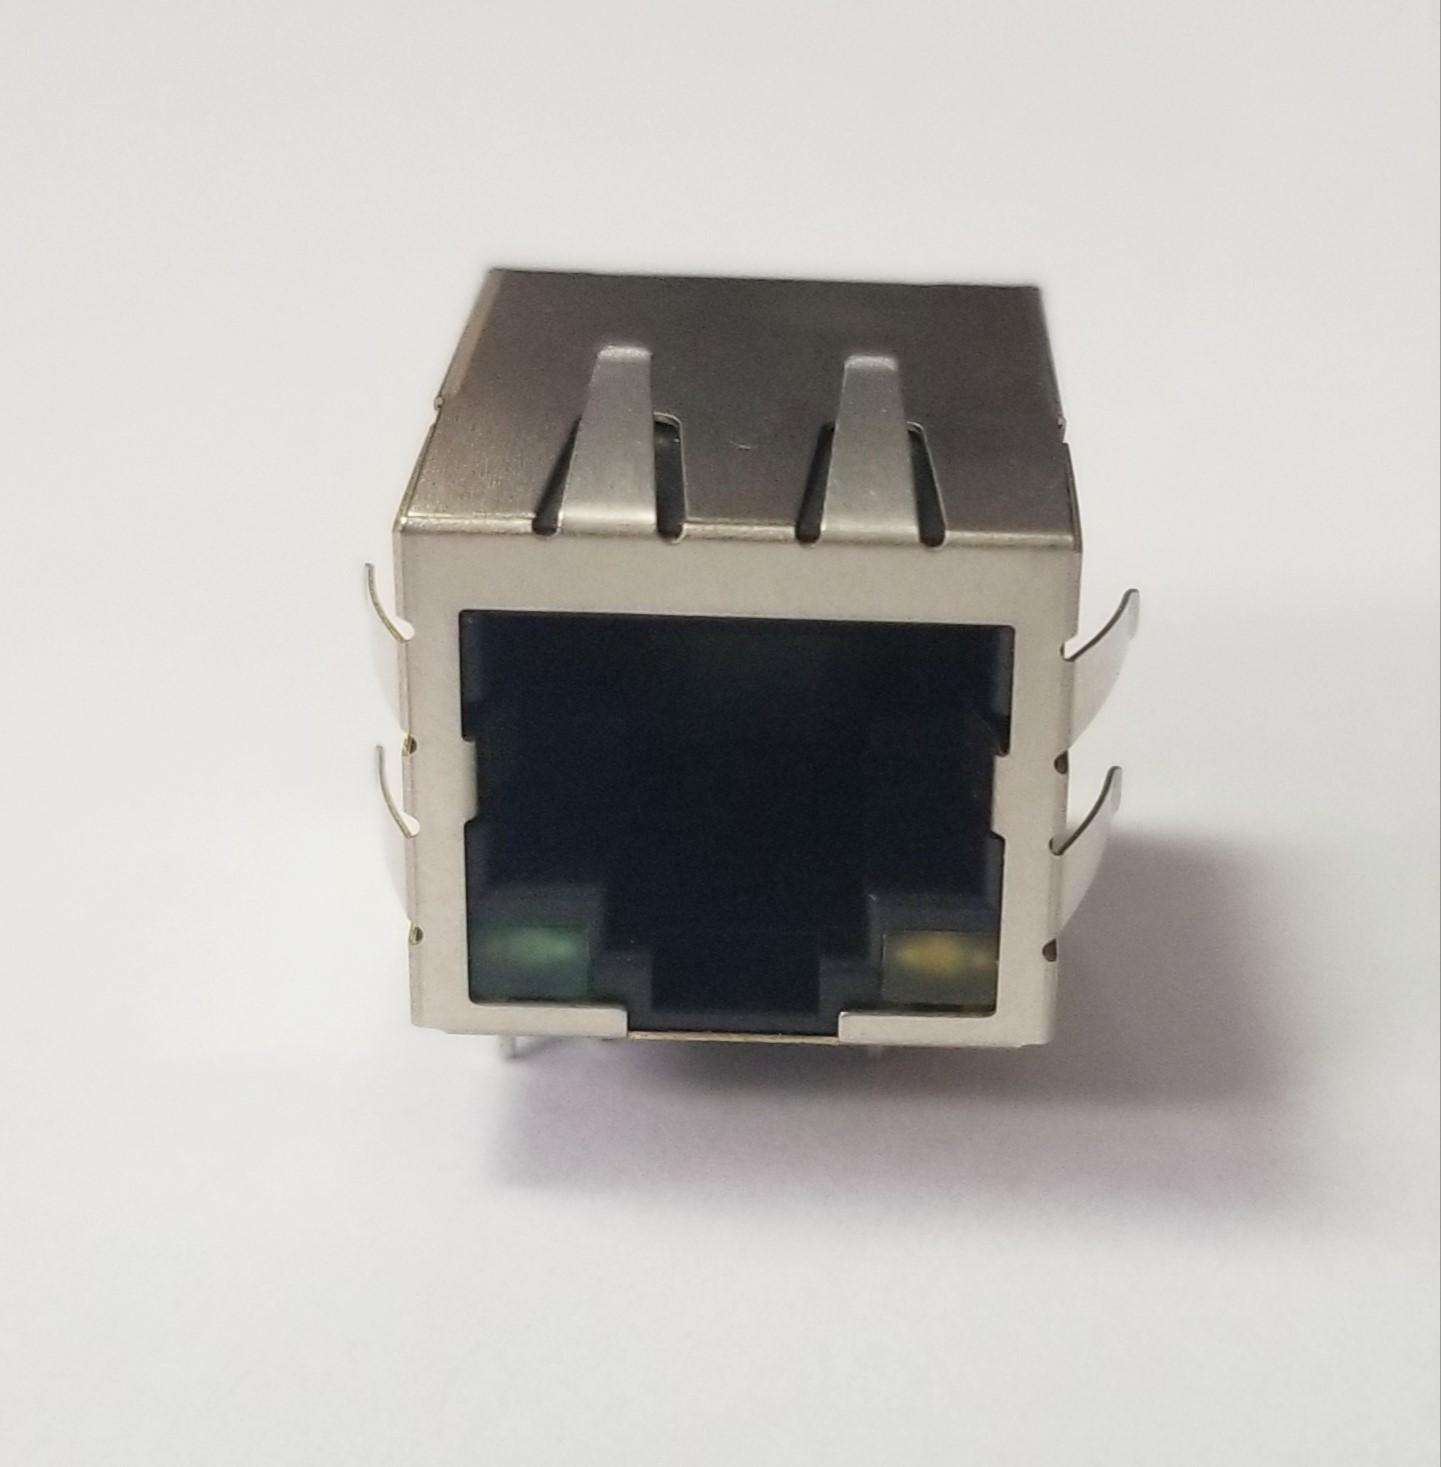 Modular Jack, Type F4, 8P8C Transformer 100MB - MJA-110VD1-FG